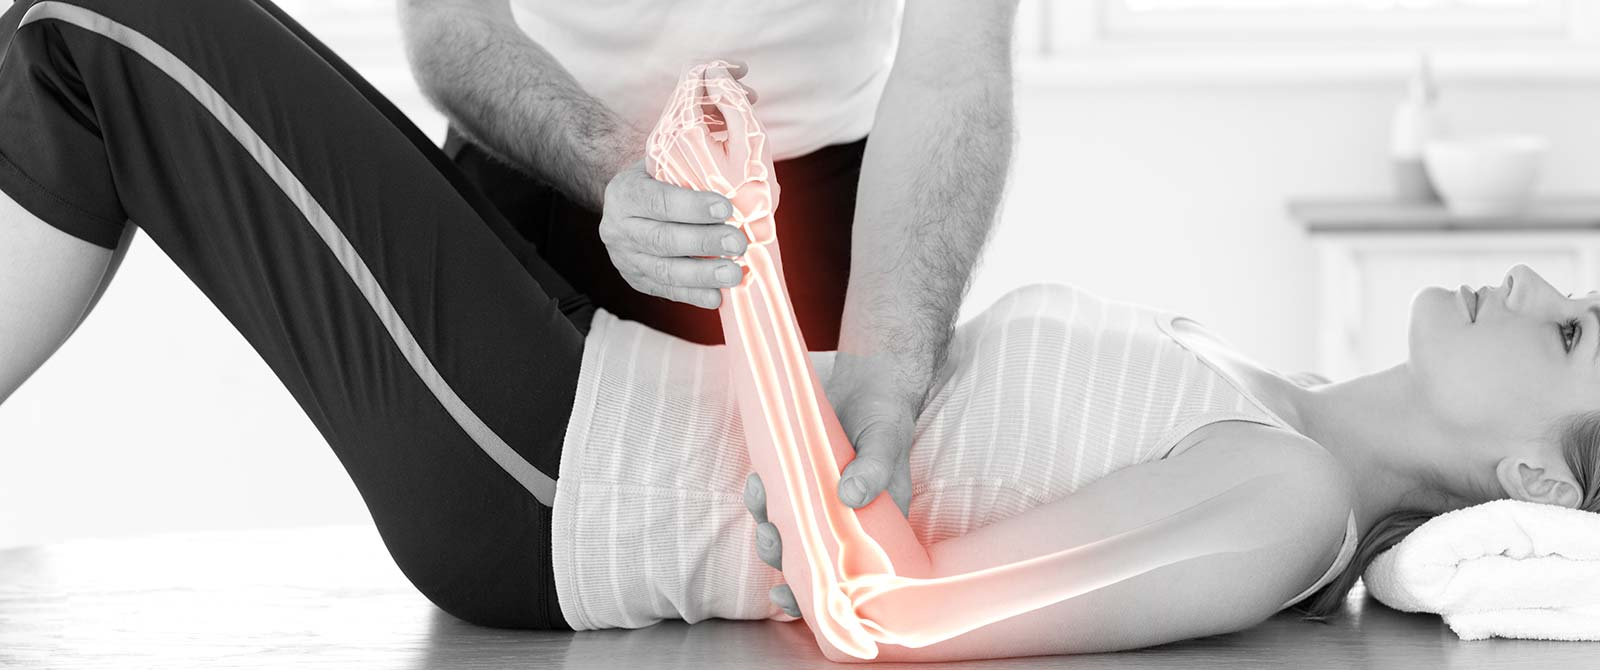 Fisioterapia Traumato-Ortopédica Funcional: Ênfase em..